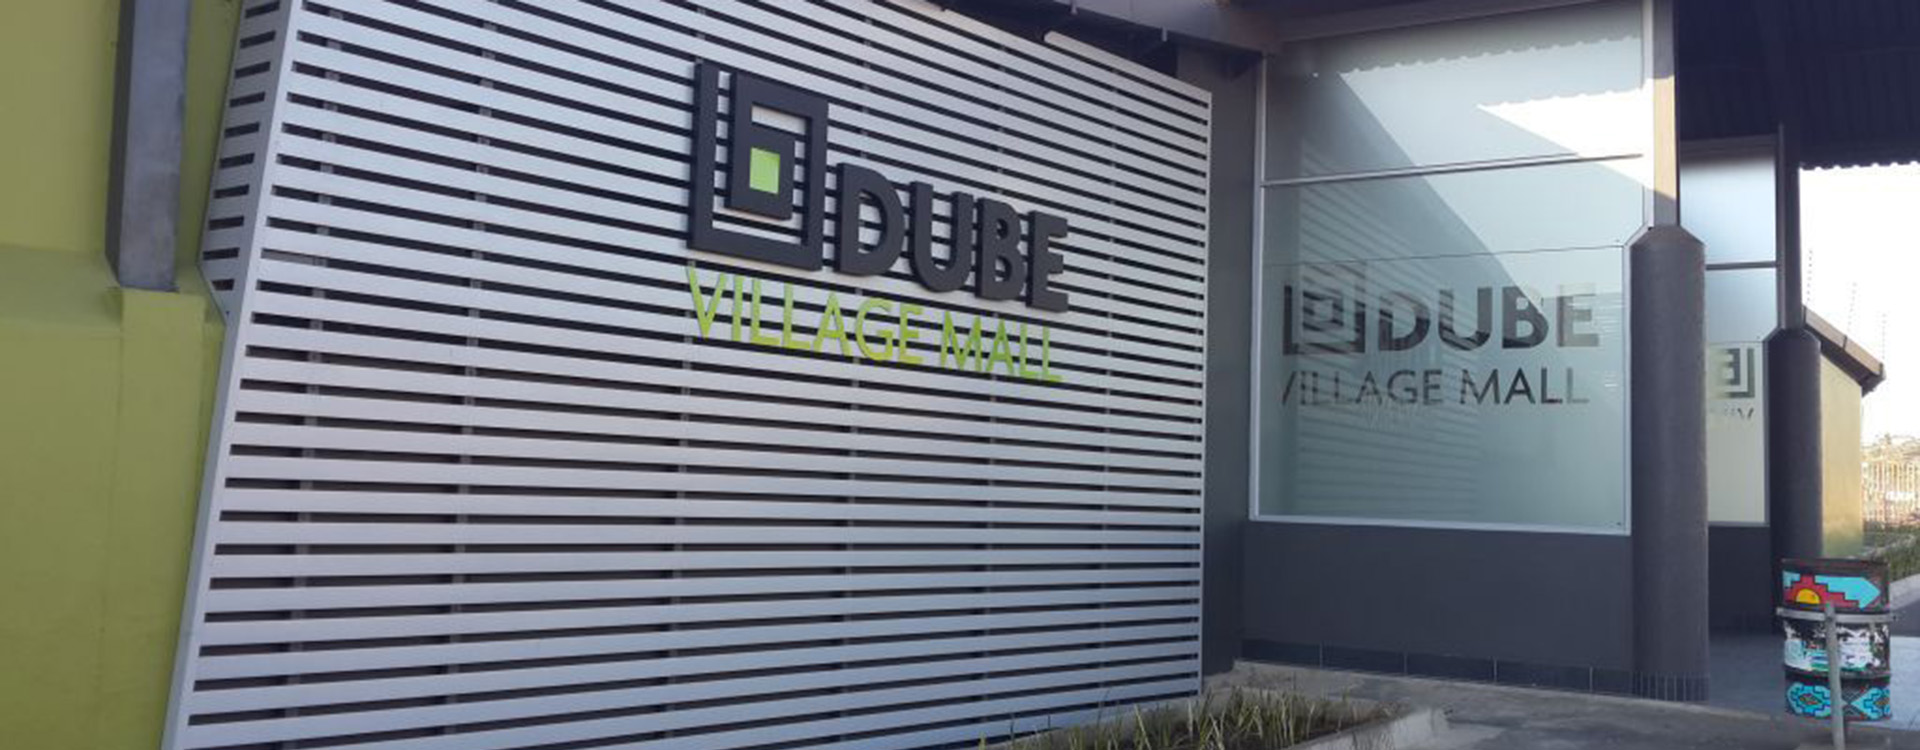 Dube-Mall-1